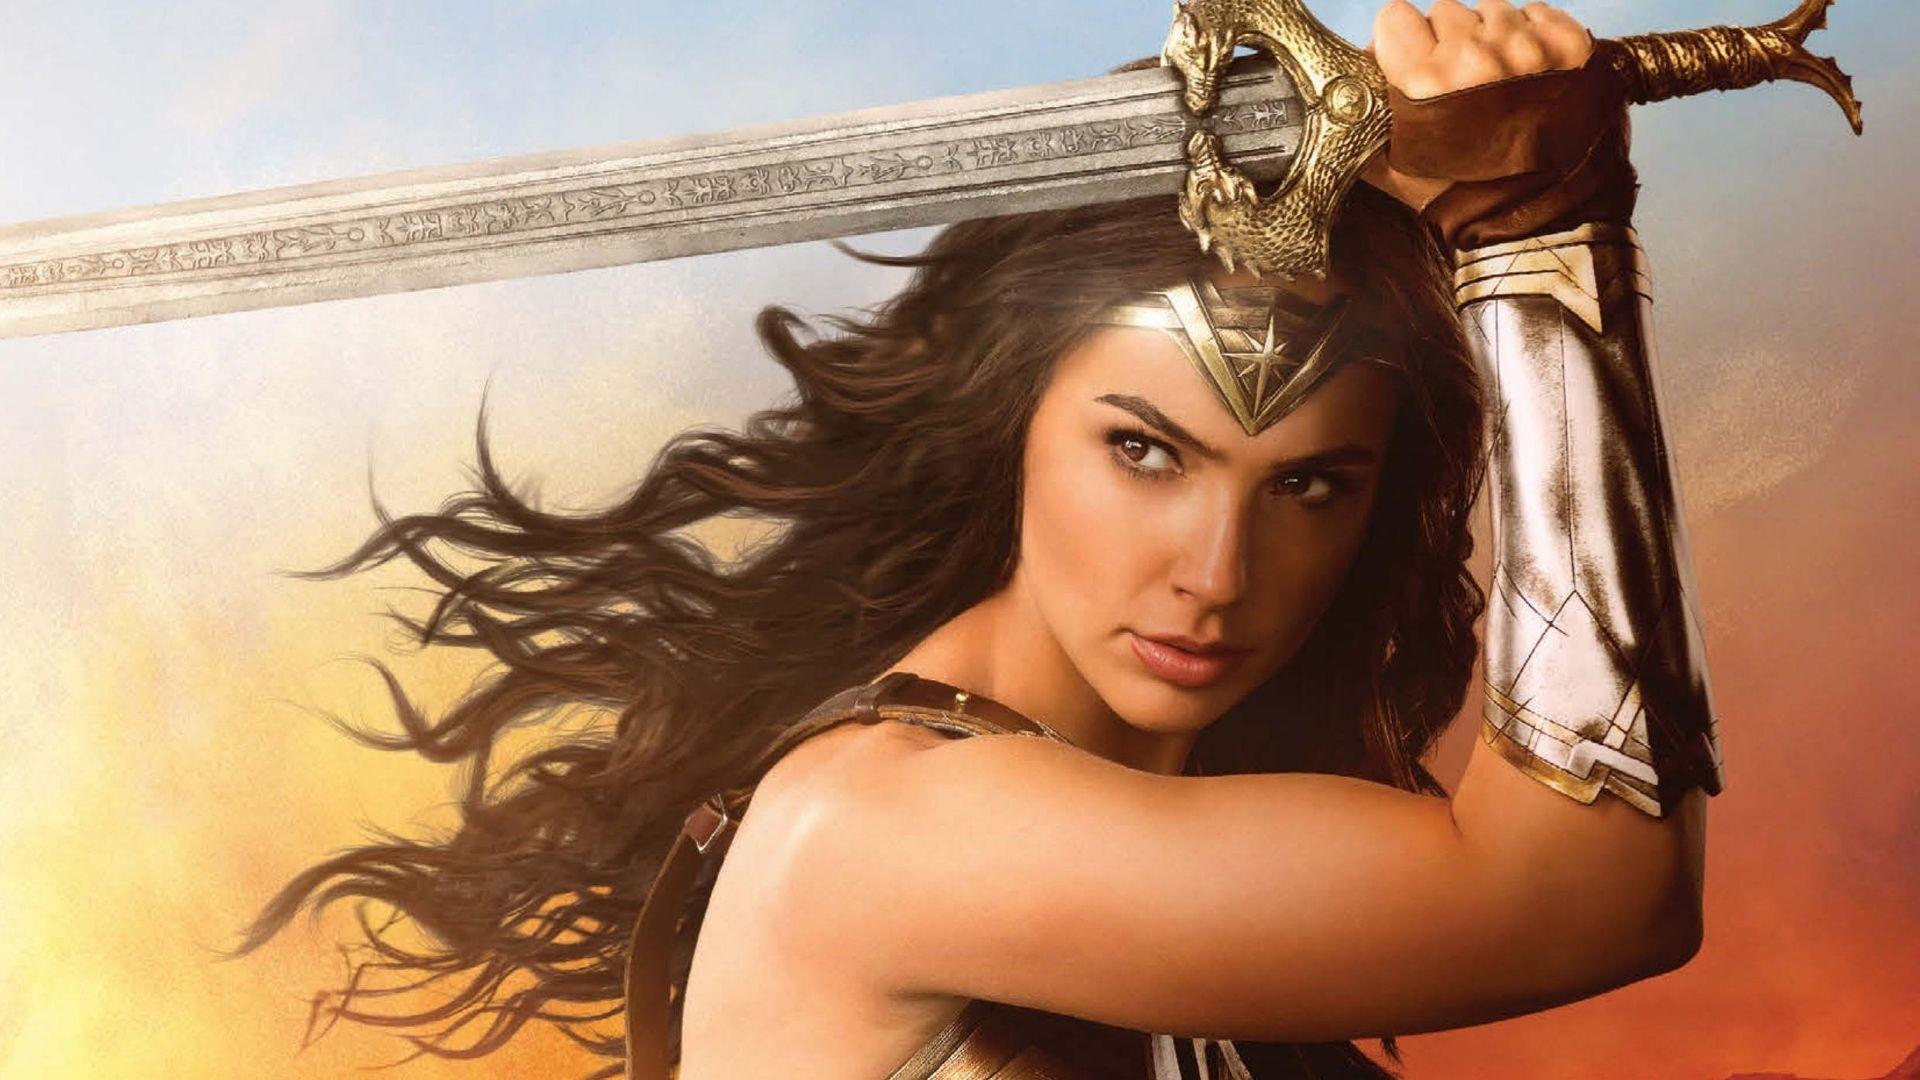 Cool Wonder Woman Sword 2017 Movie Gal Gadot 1920x1080 Wallpaper Check More At